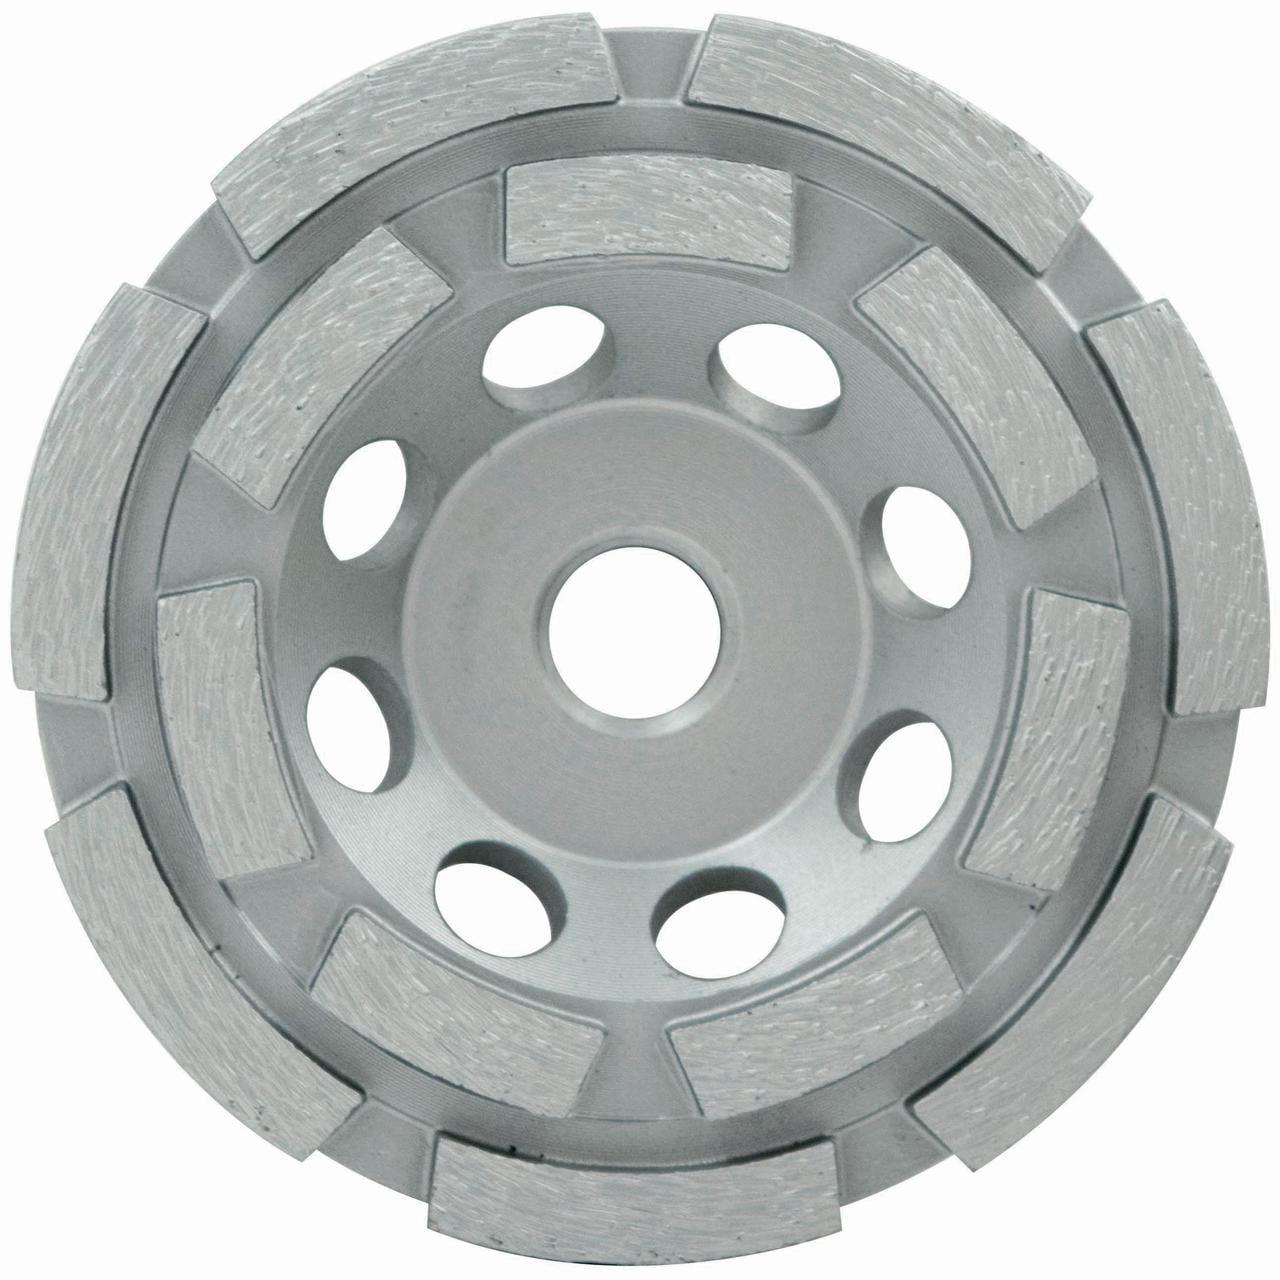 "5"" Spp Series Double Row Cup Wheel, Wet/Dry, 5/8""-11 Thread"